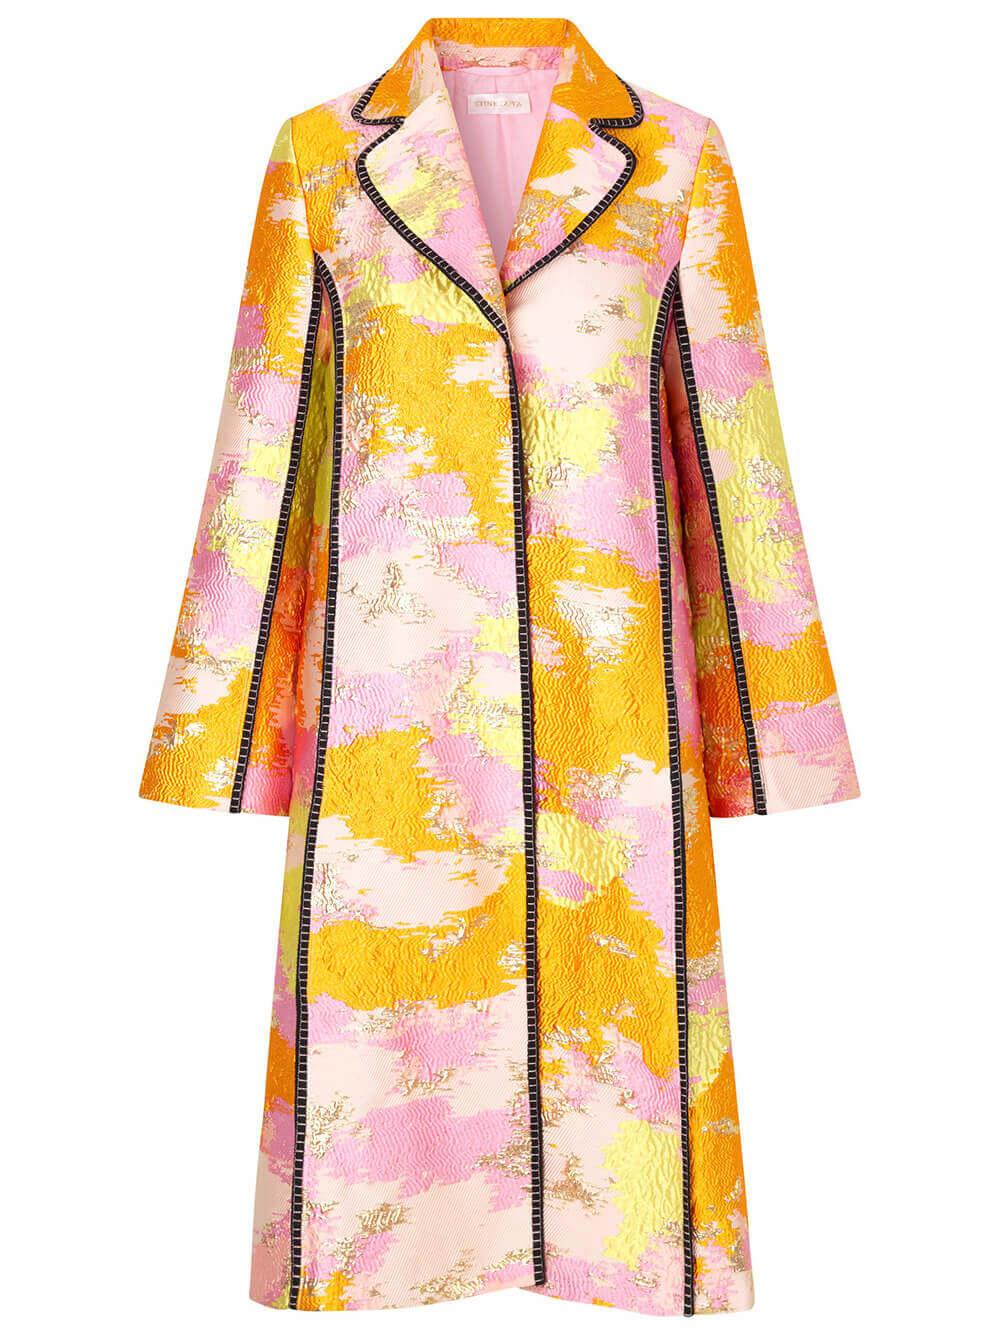 Tommy Coat Item # SG3603